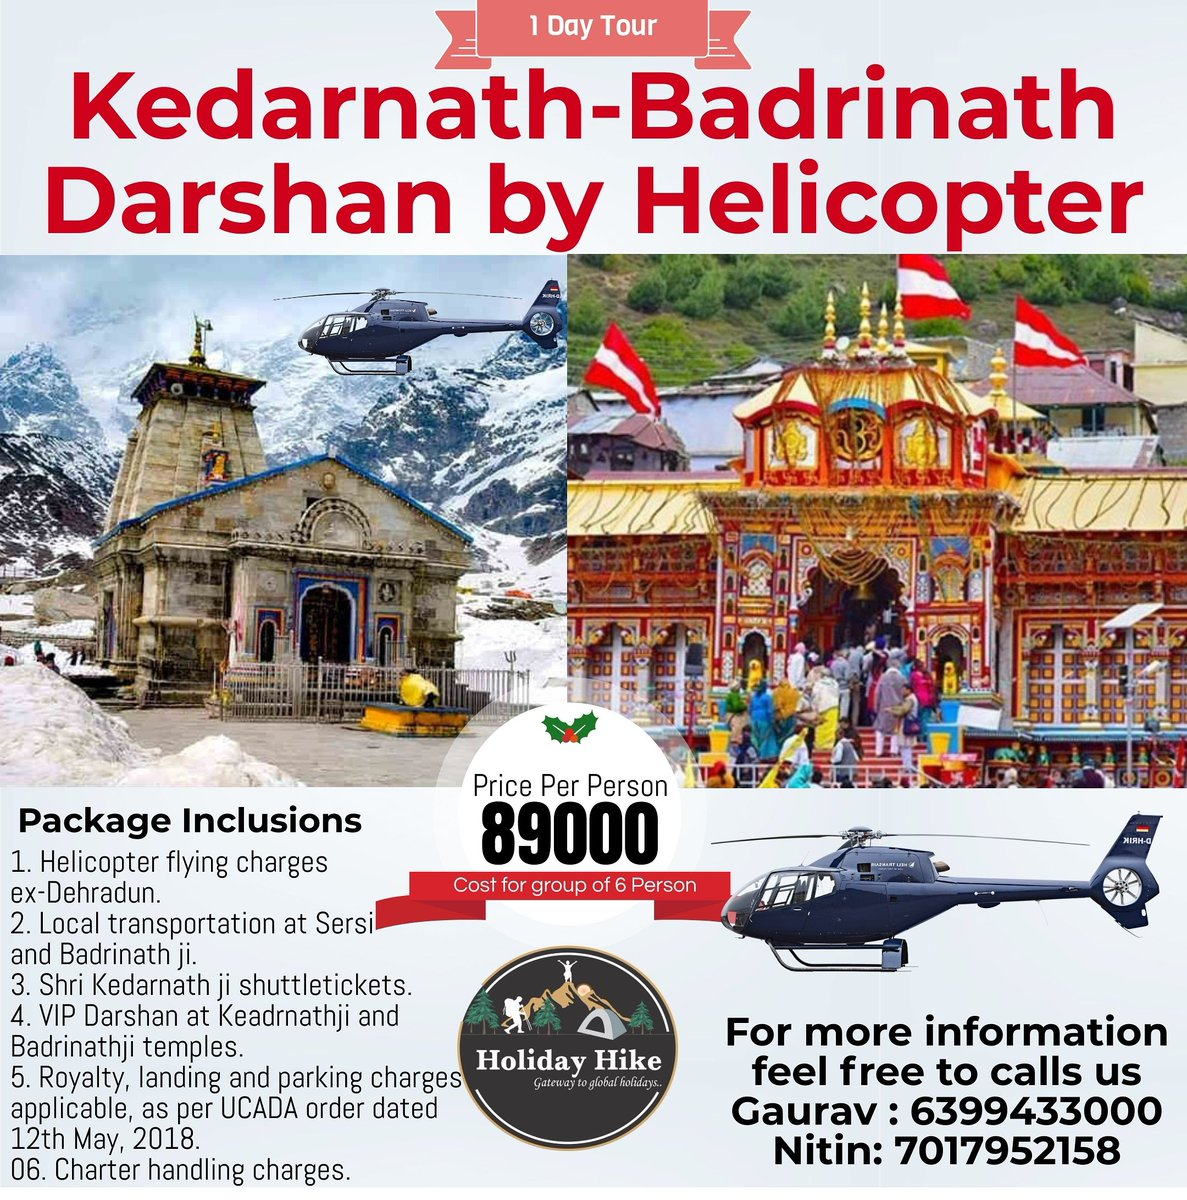 Kedarnath-Badrinath Darshan by Helicopter #Kedarnath , #badrinath, #chardhamyatra, #religioustrip https://t.co/tRAndWvwsc